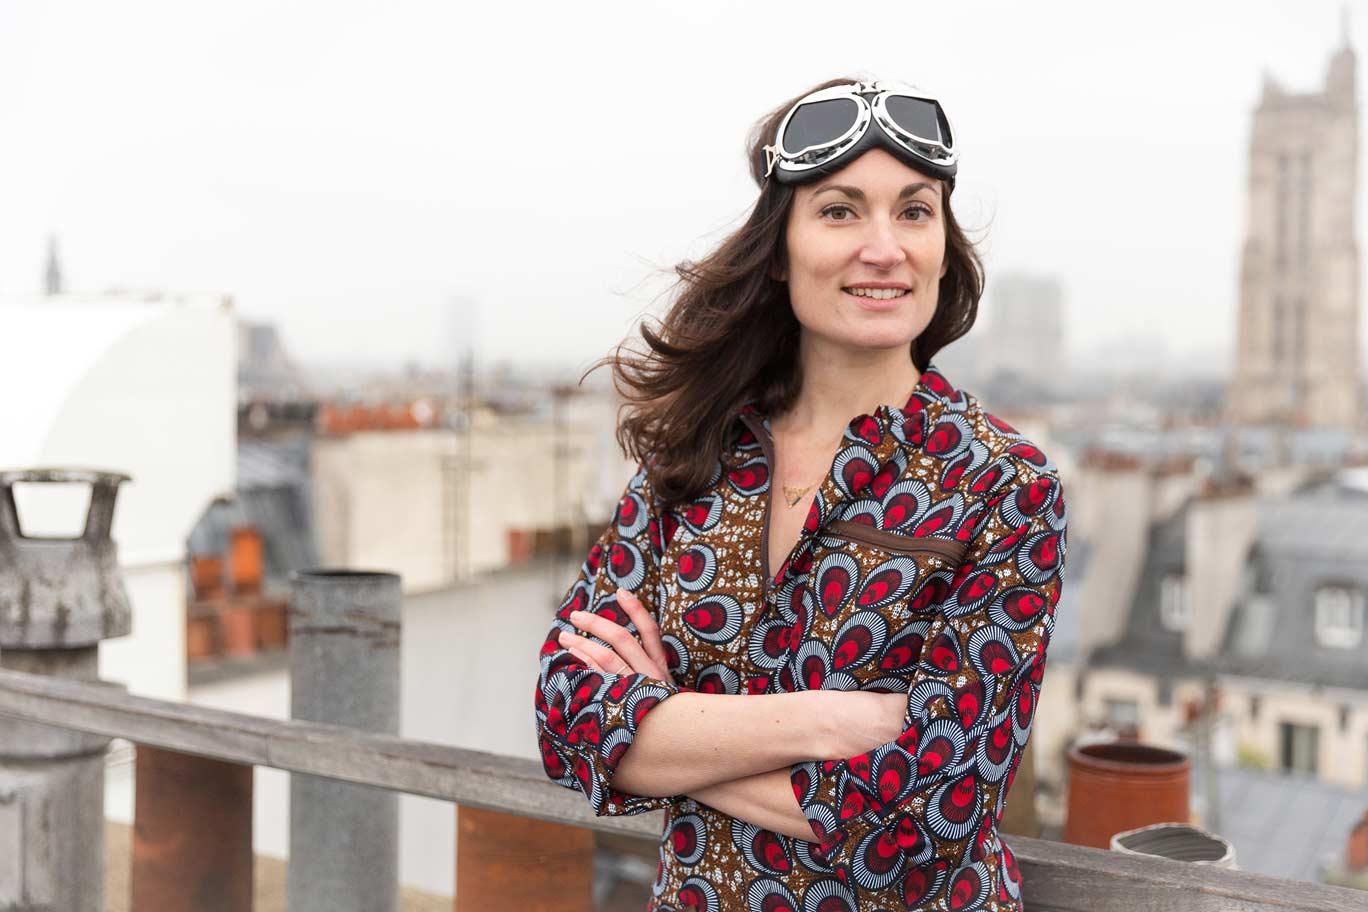 Ines-Aramburo-photographe-paris-portrait-lifestyle-seance-photo-photoshoot-photographer29.jpg